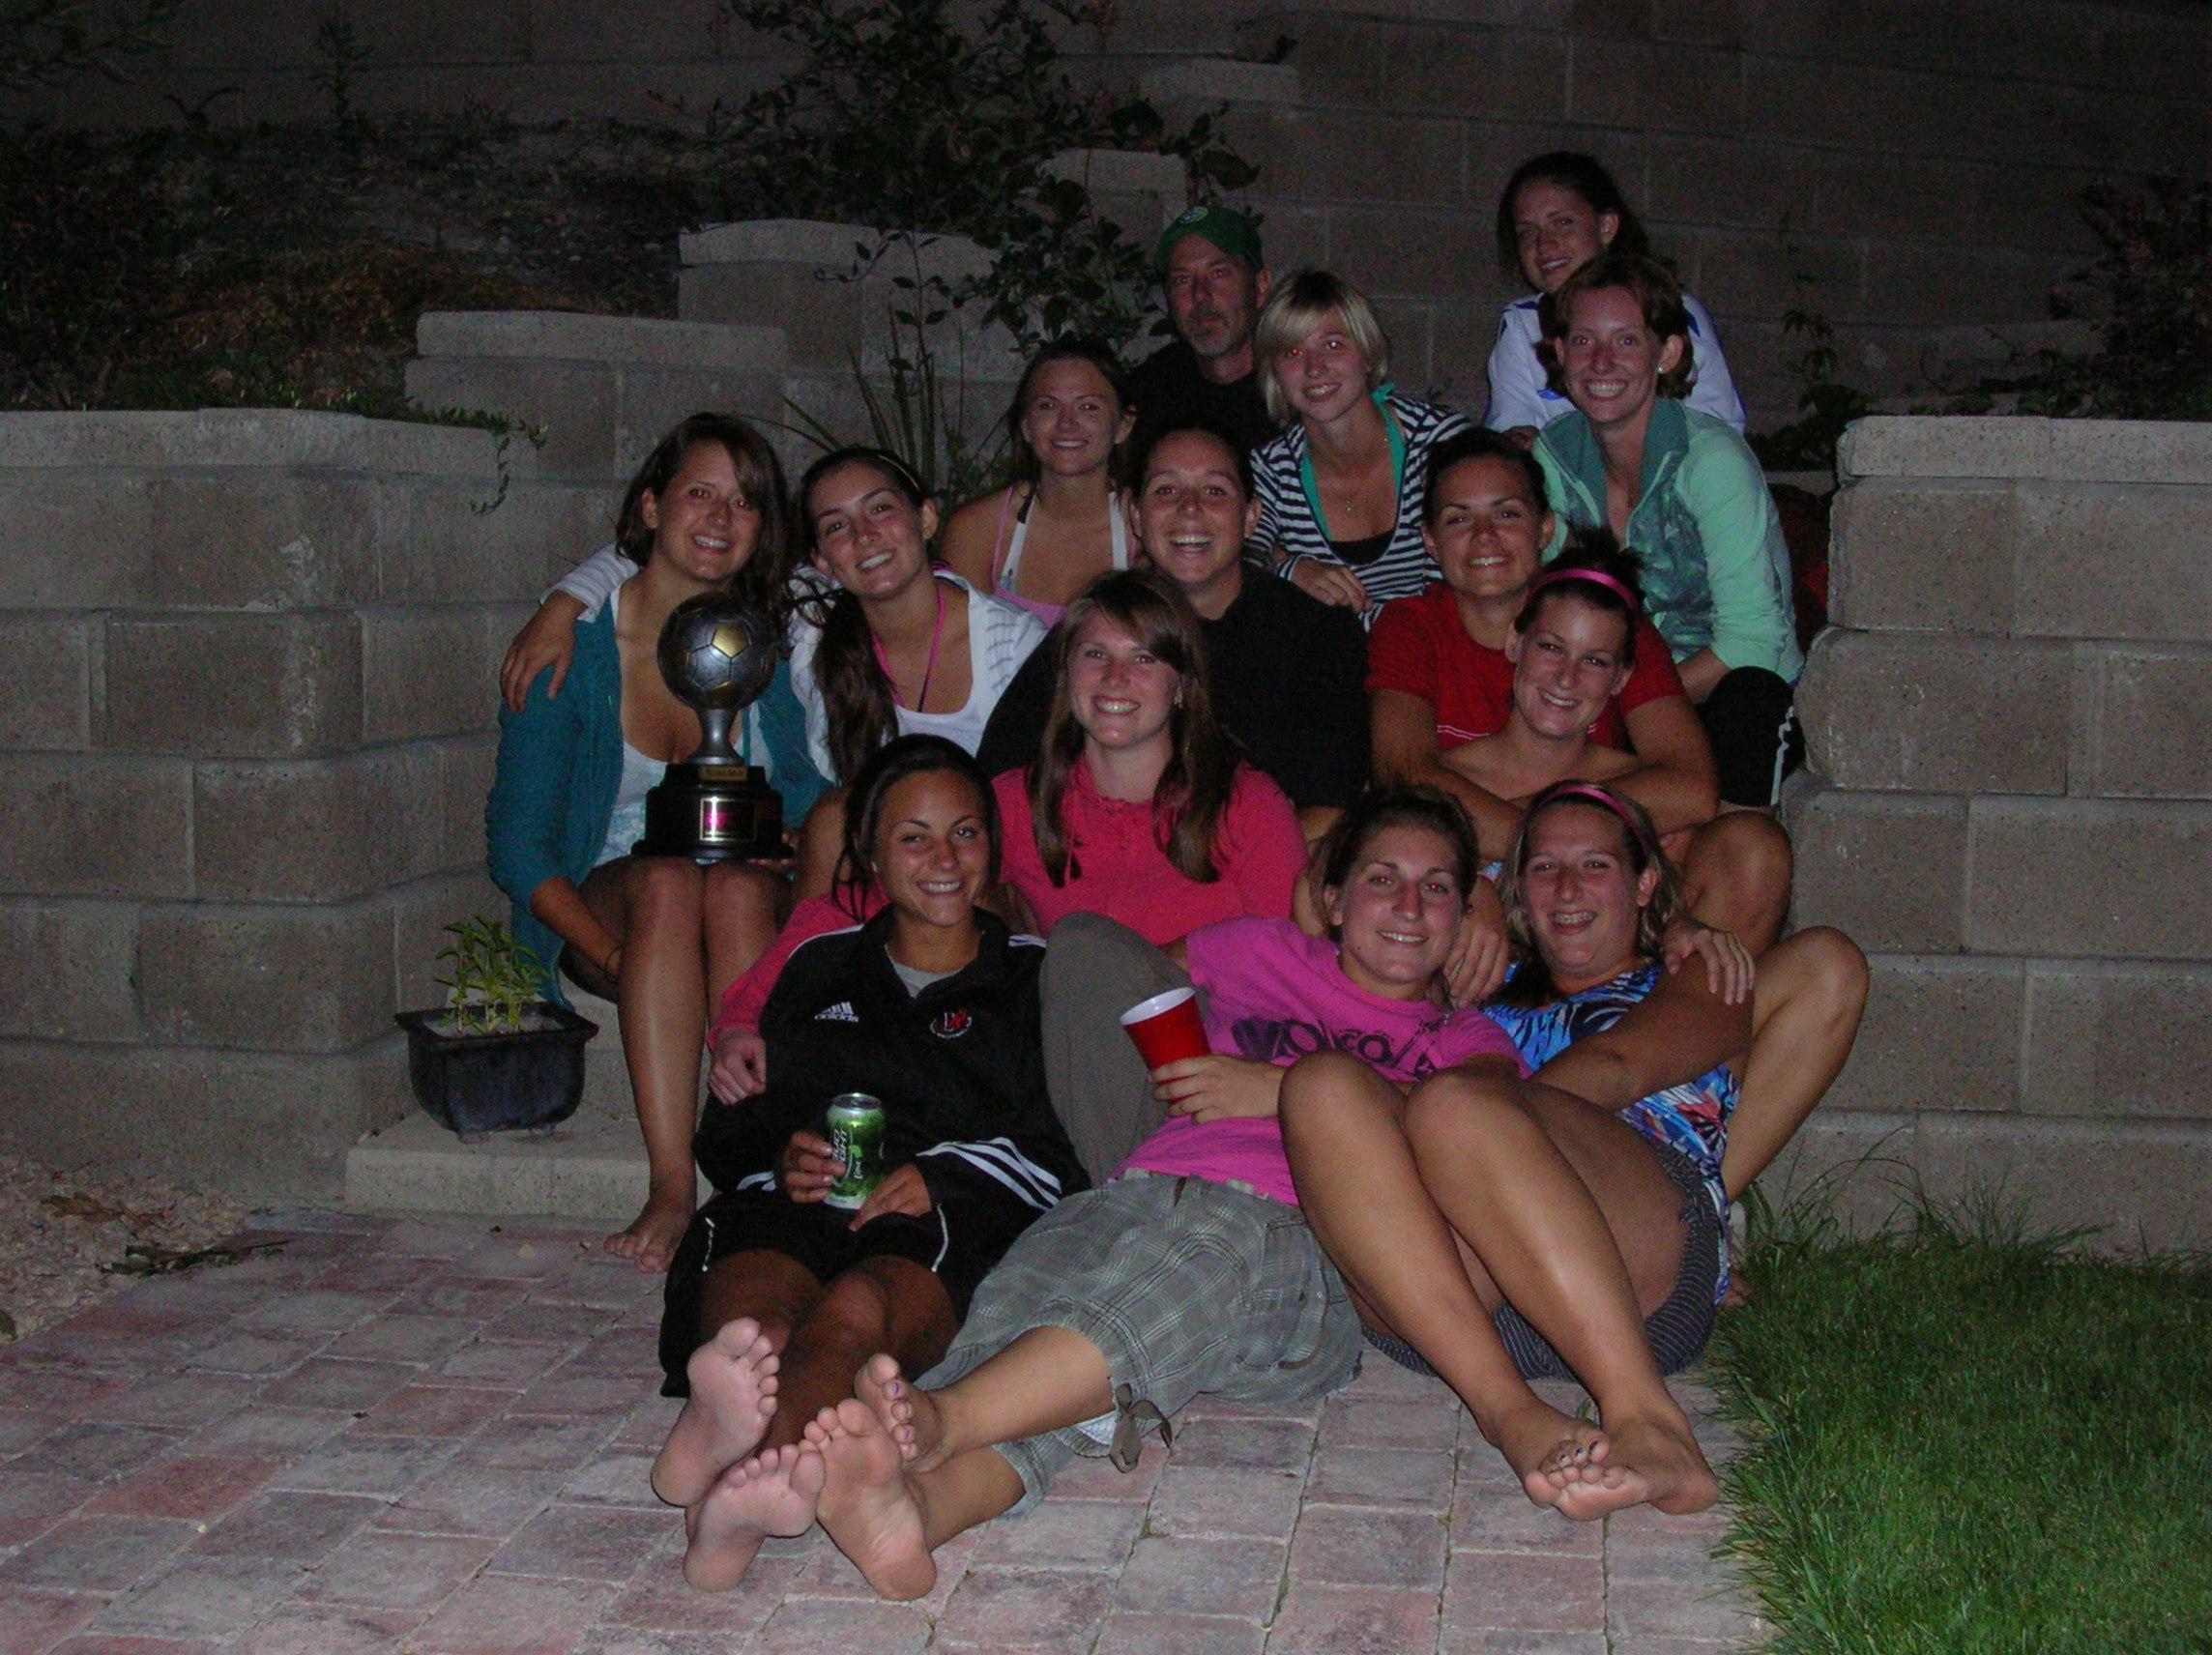 Beccs party '09 MVP